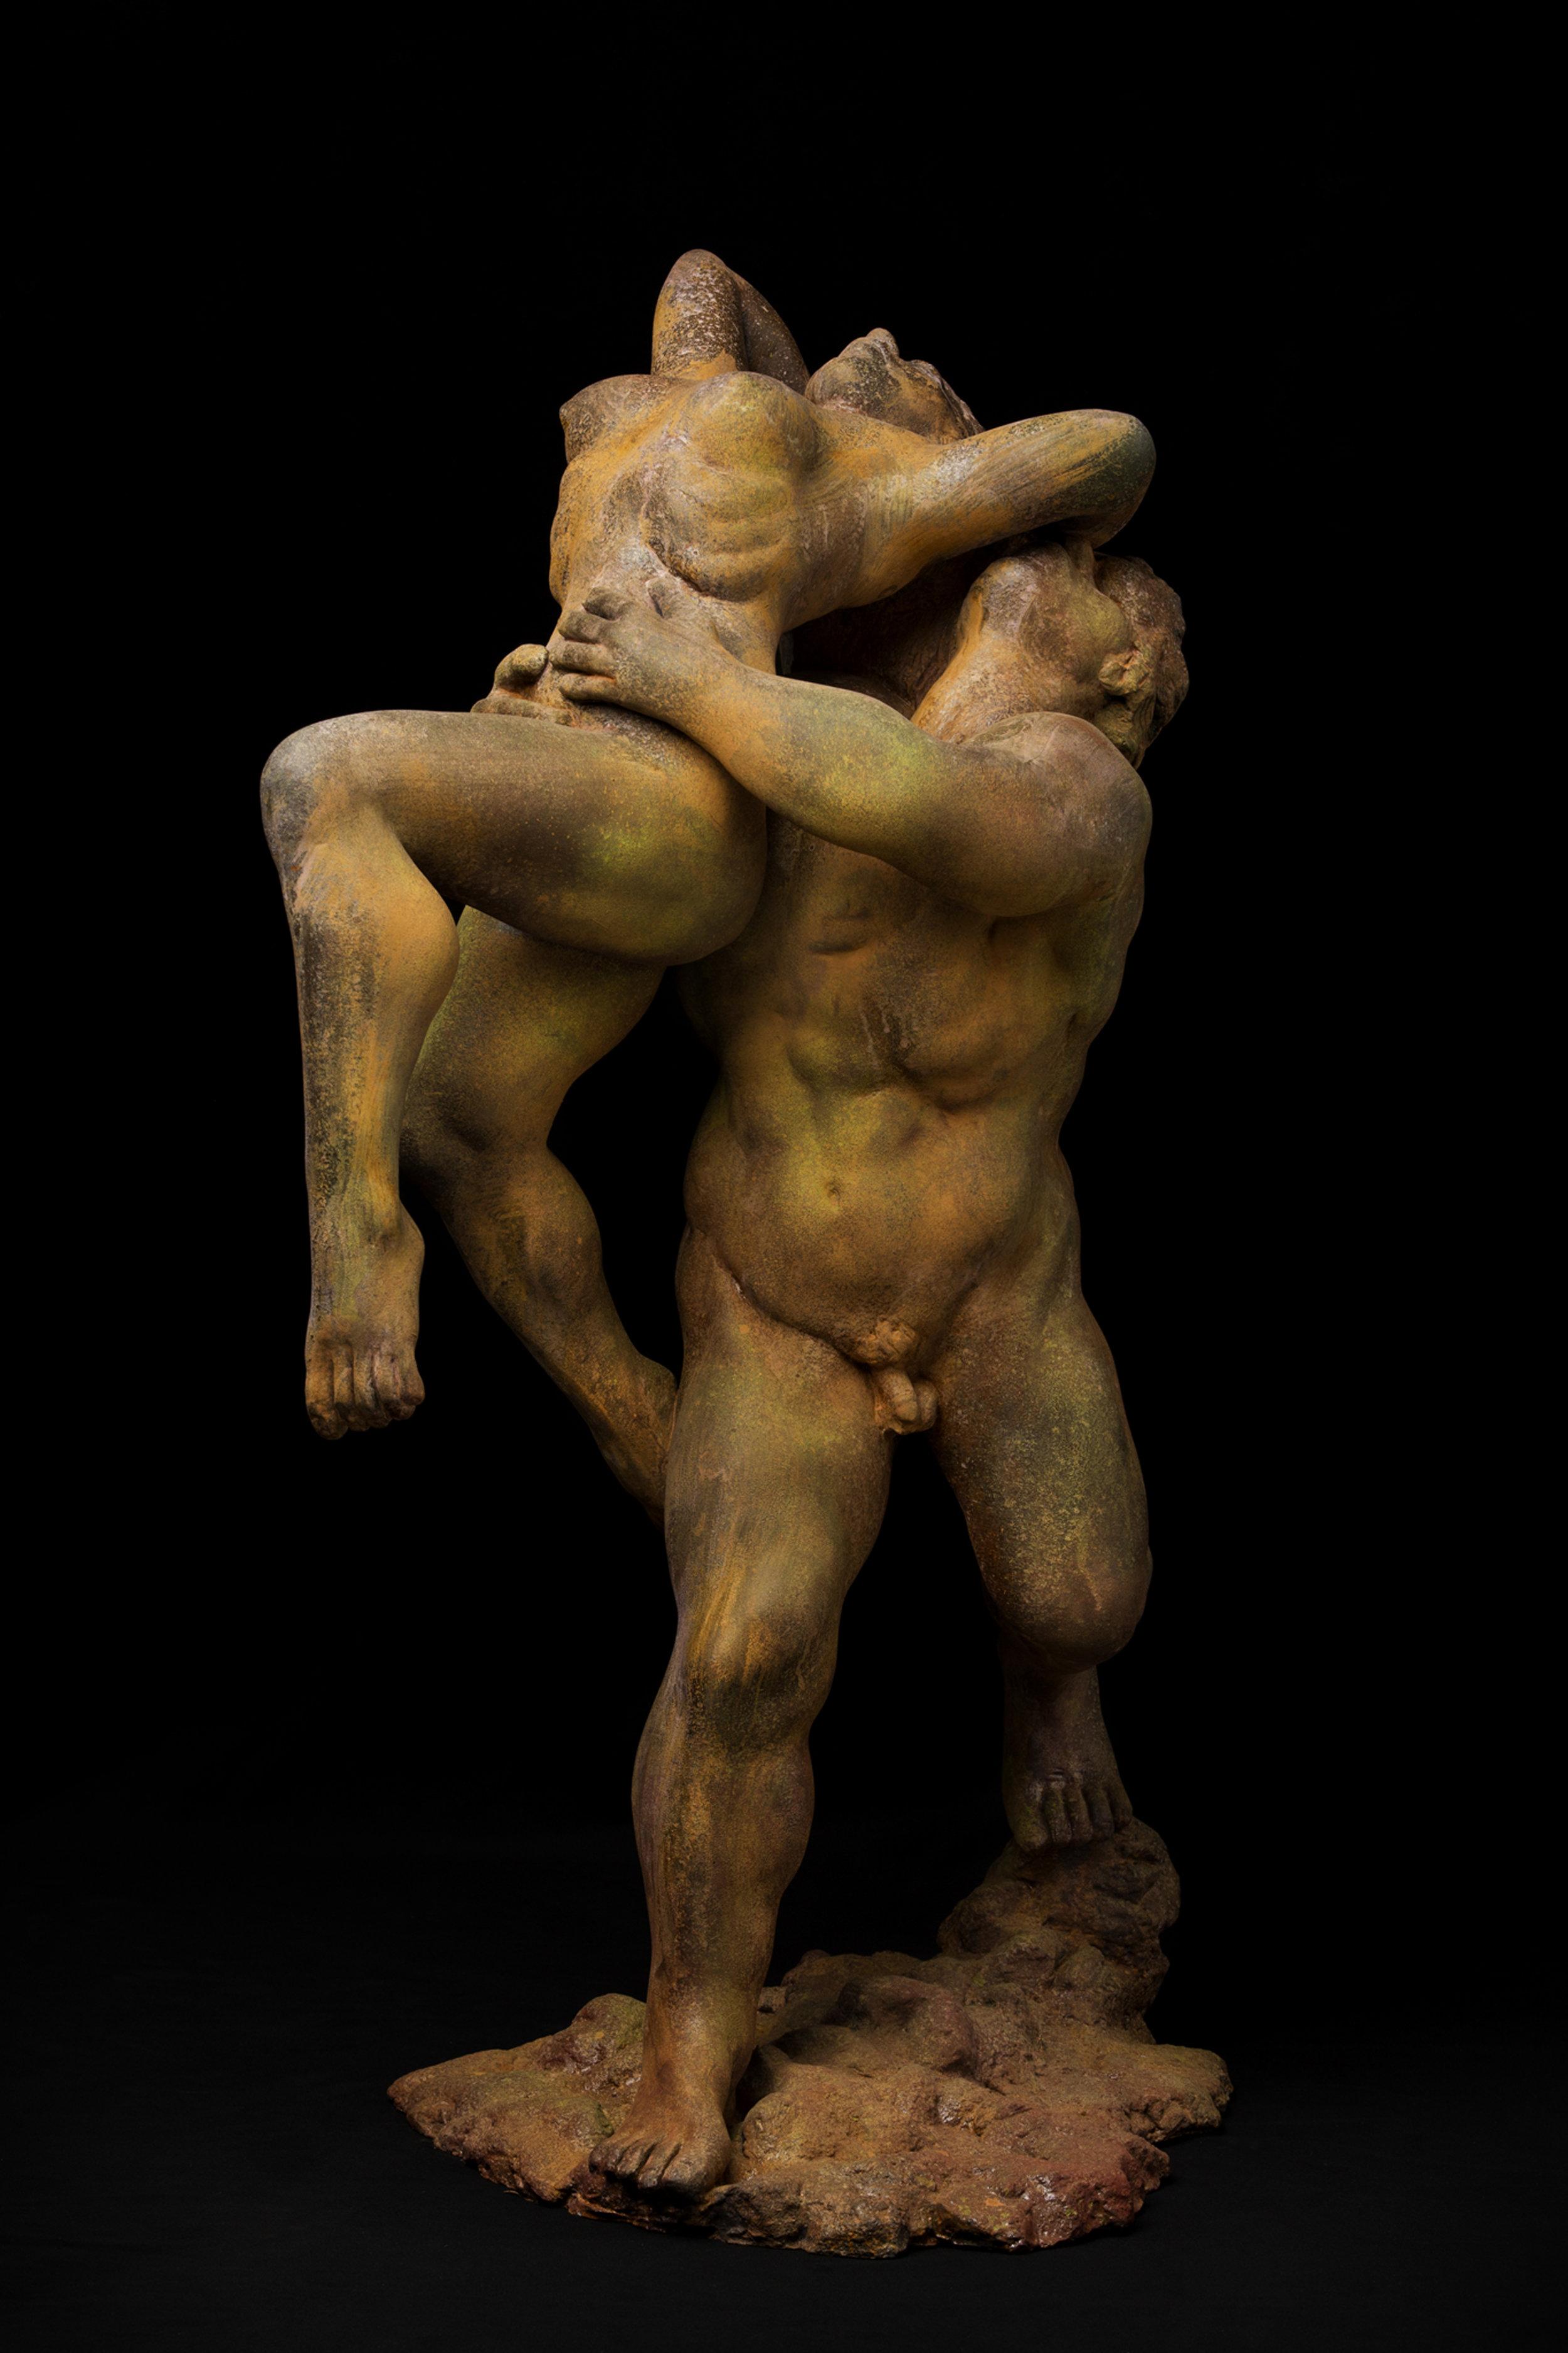 Glenn Marlowe Title: The Lovers Size: 20 x 12 x 8 Price: $5000